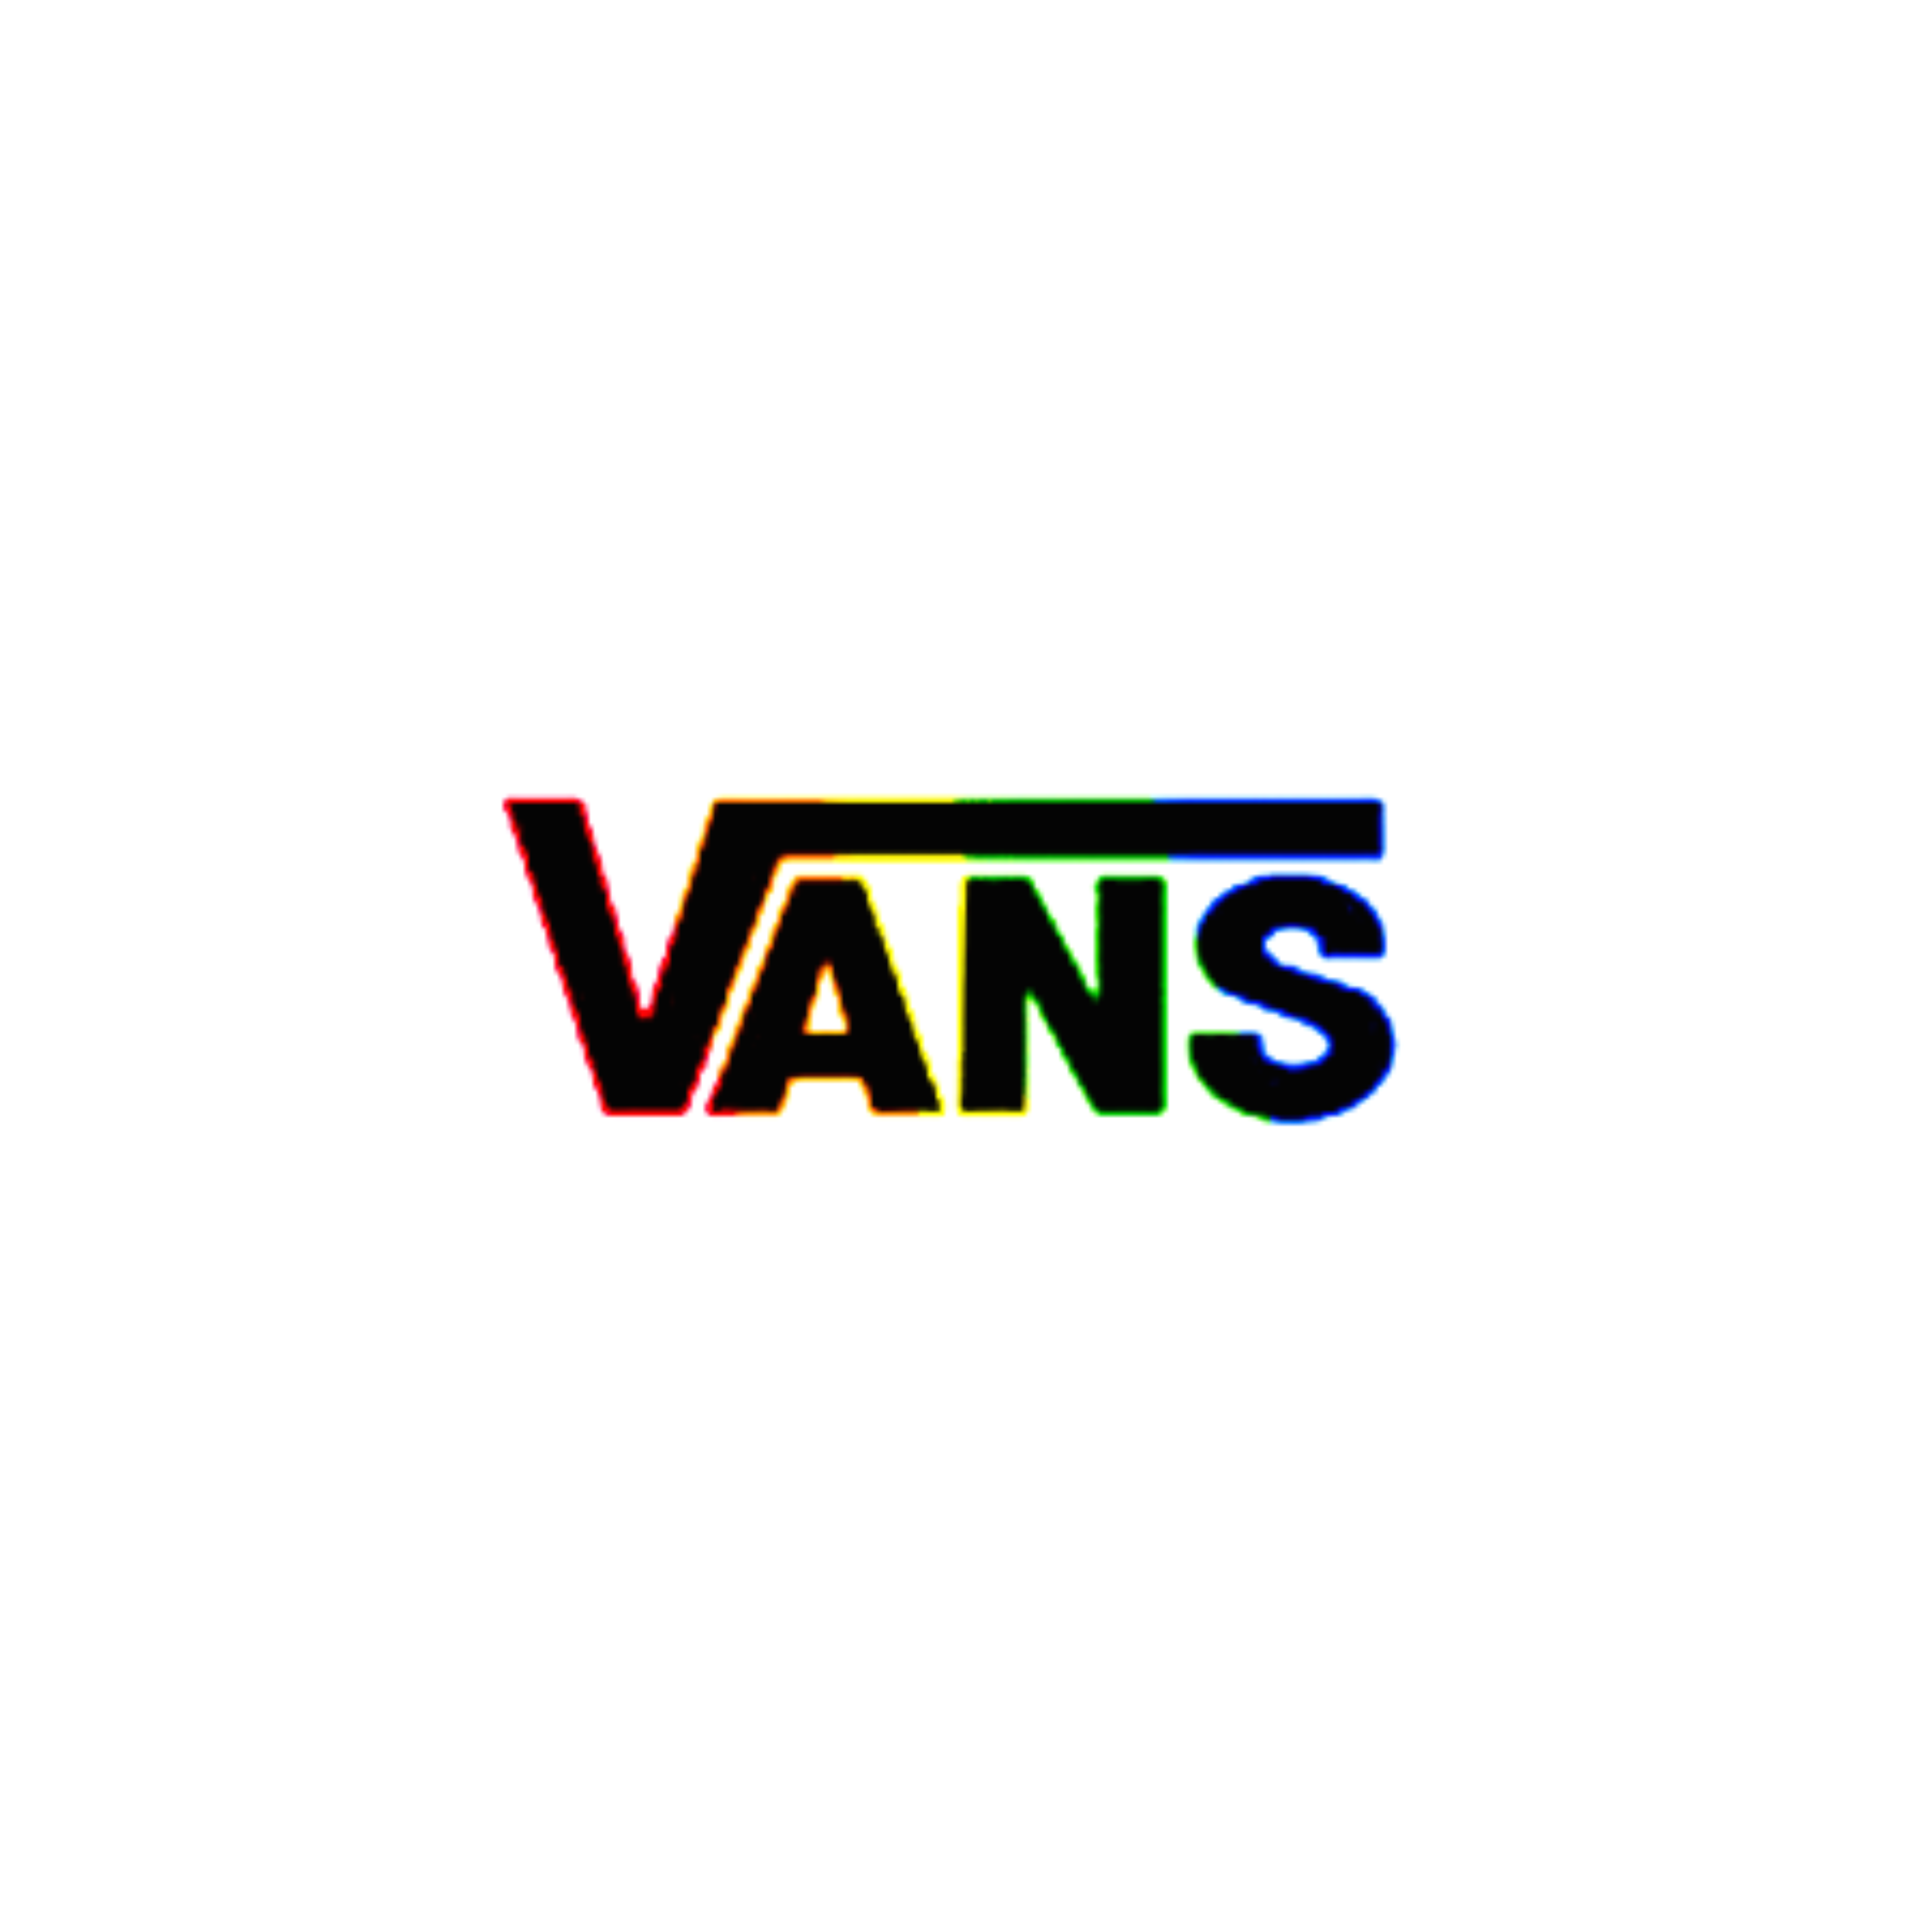 vans shoes logo cute rainbow brands